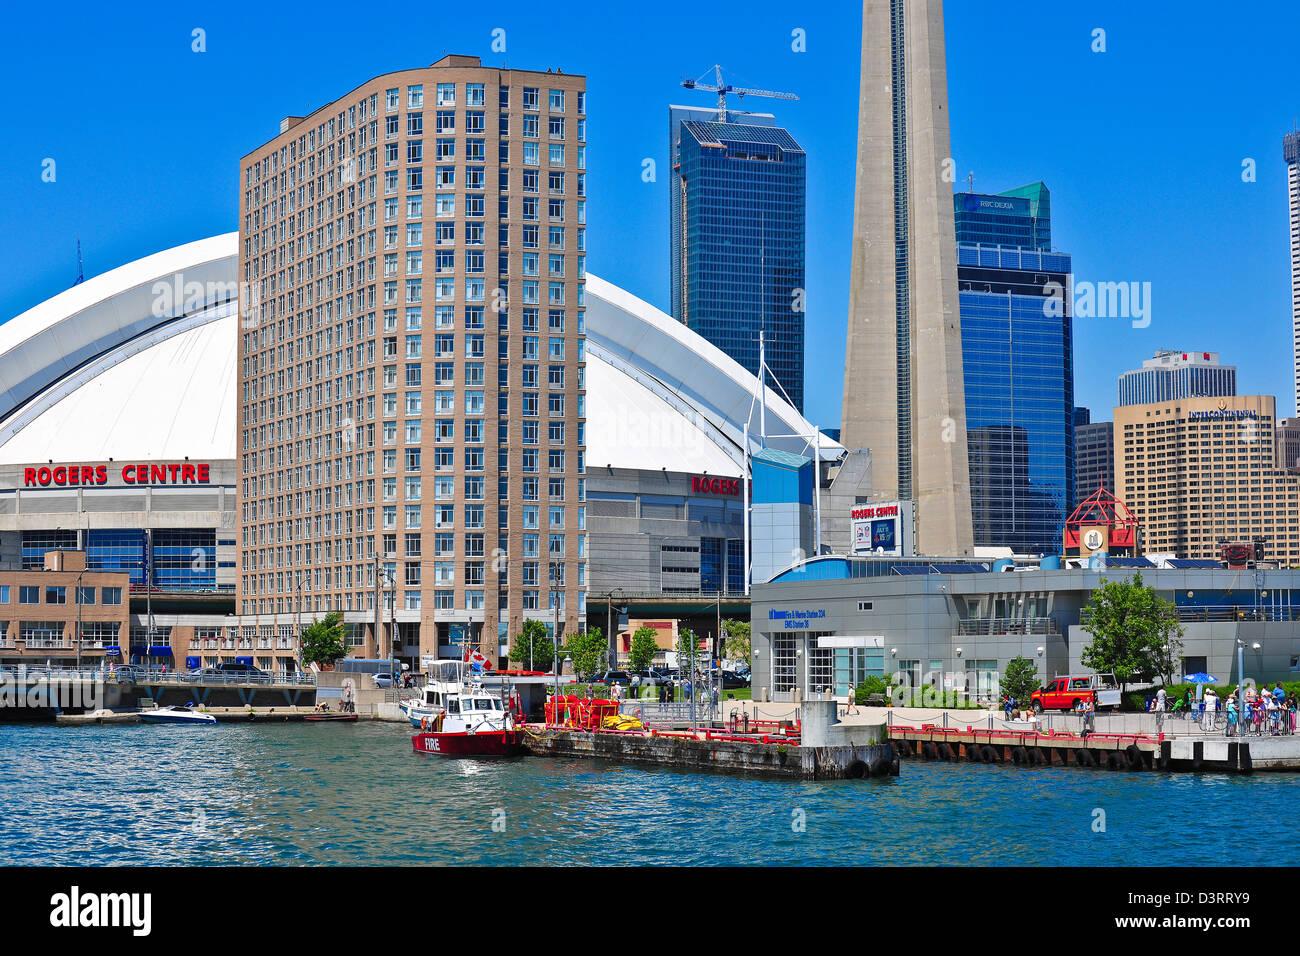 Toronto Skydome view from the lake Ontario - Stock Image